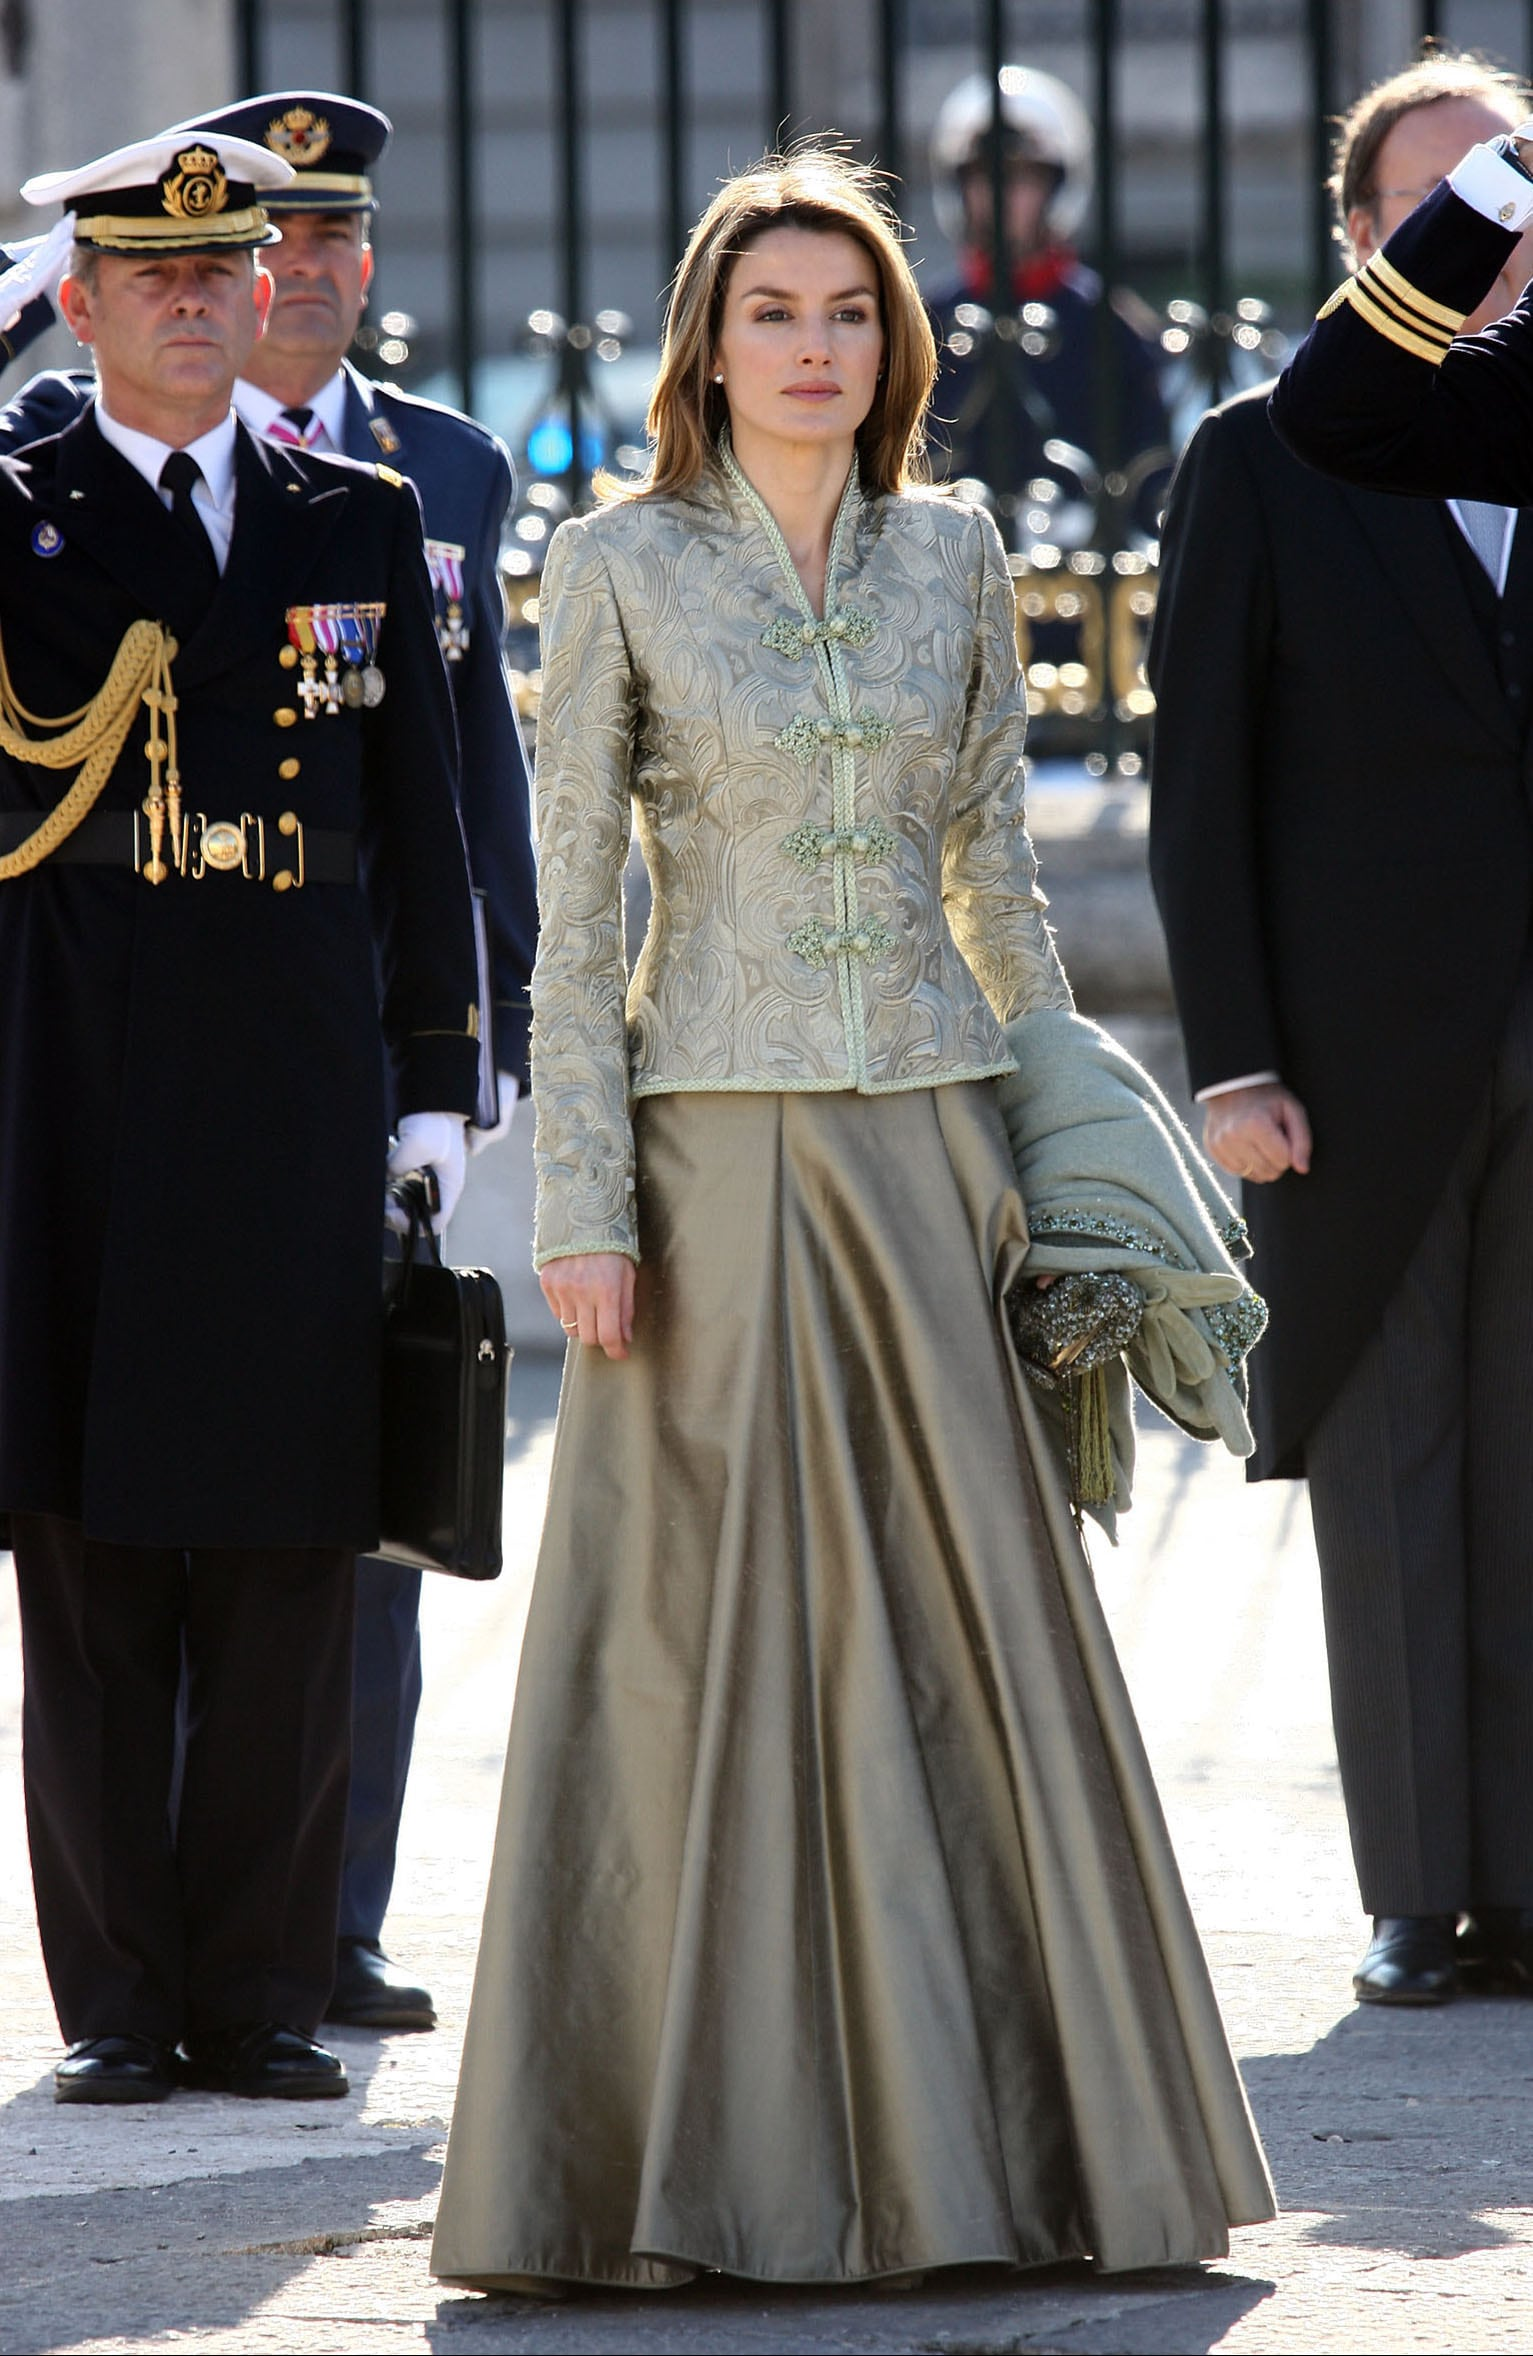 pascua-militar-2009